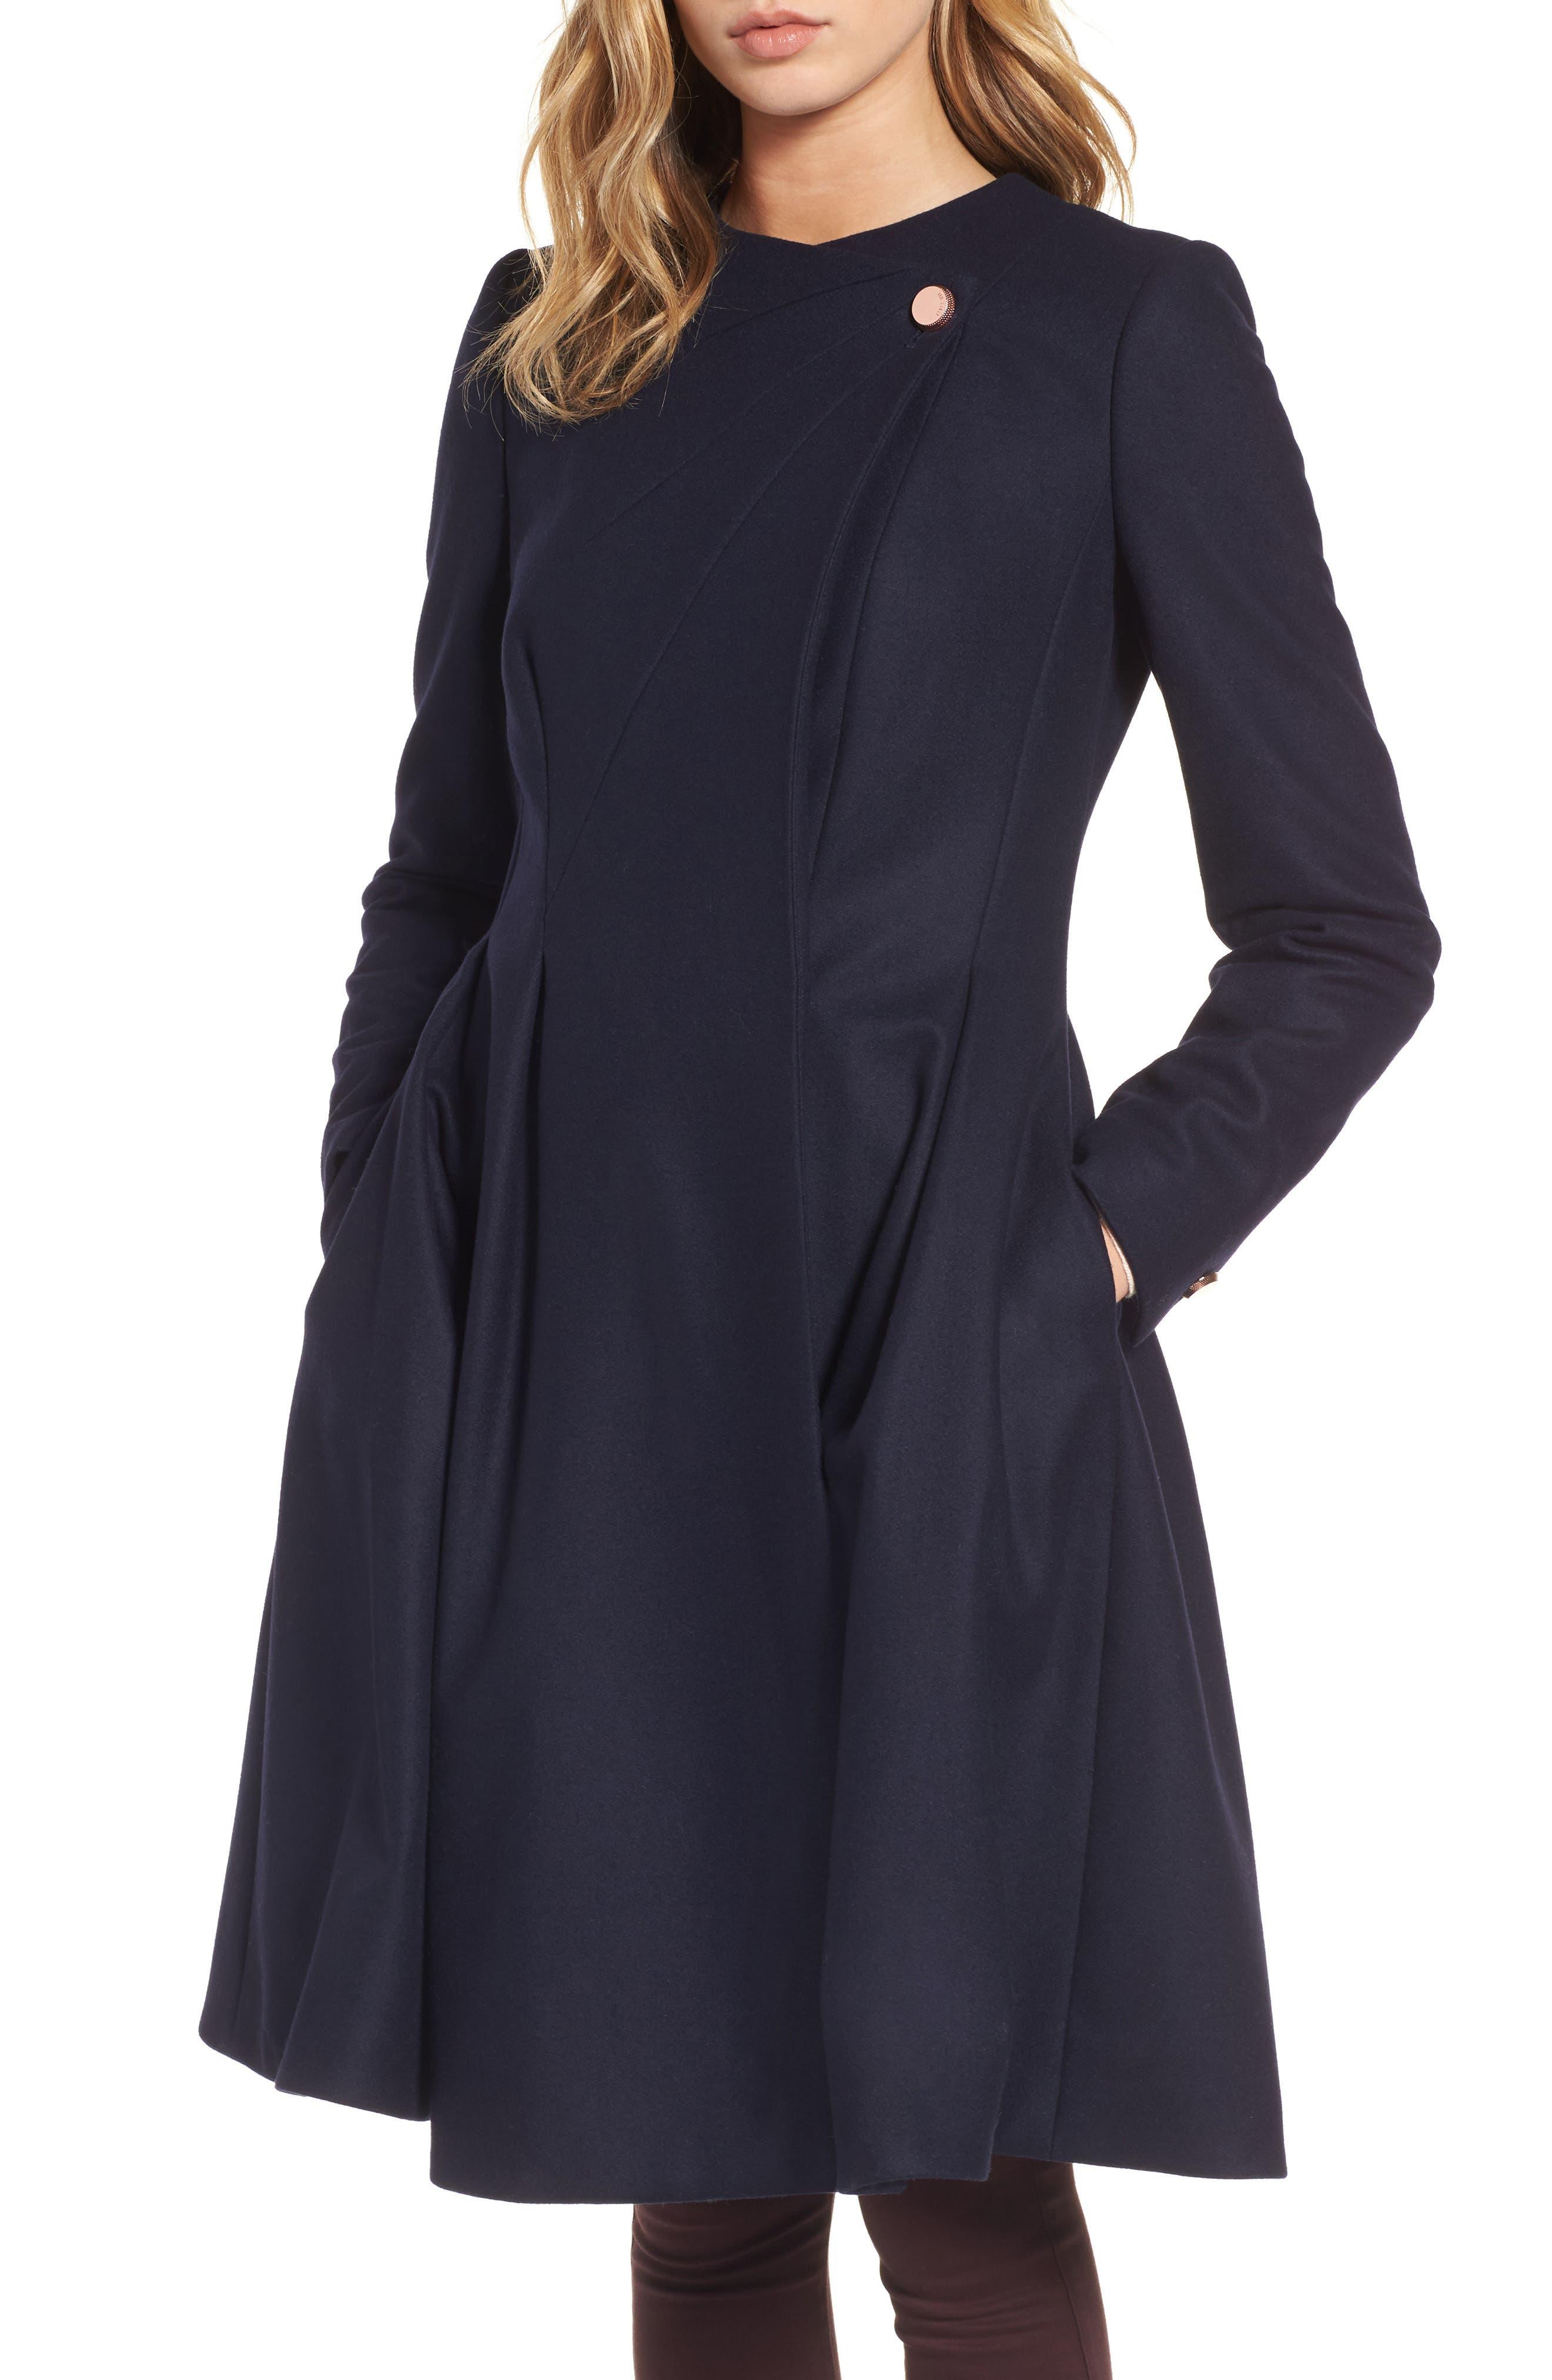 Wool Blend Asymmetrical Skirted Coat,                             Main thumbnail 1, color,                             Navy